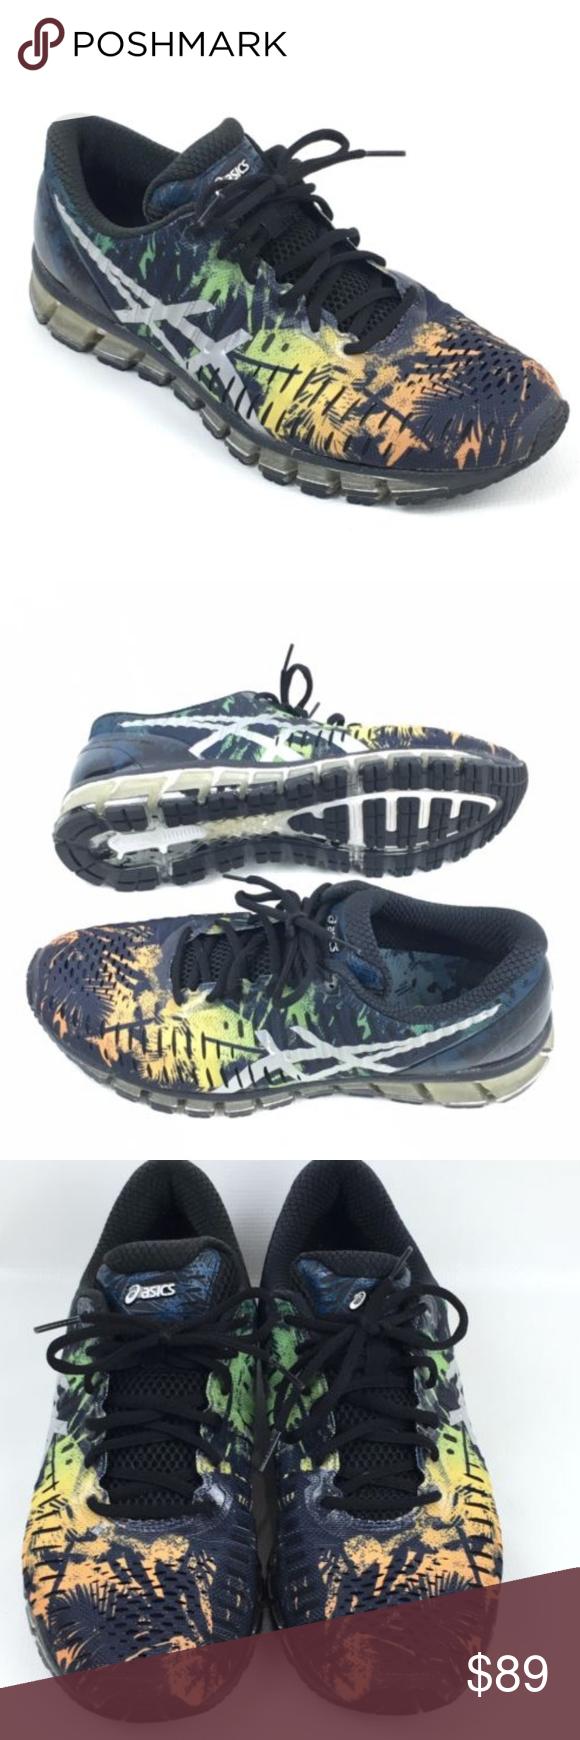 reputable site 28299 f2d31 ASICS Gel Quantum 360 Running Shoes Mens Size 11 Excellent ...